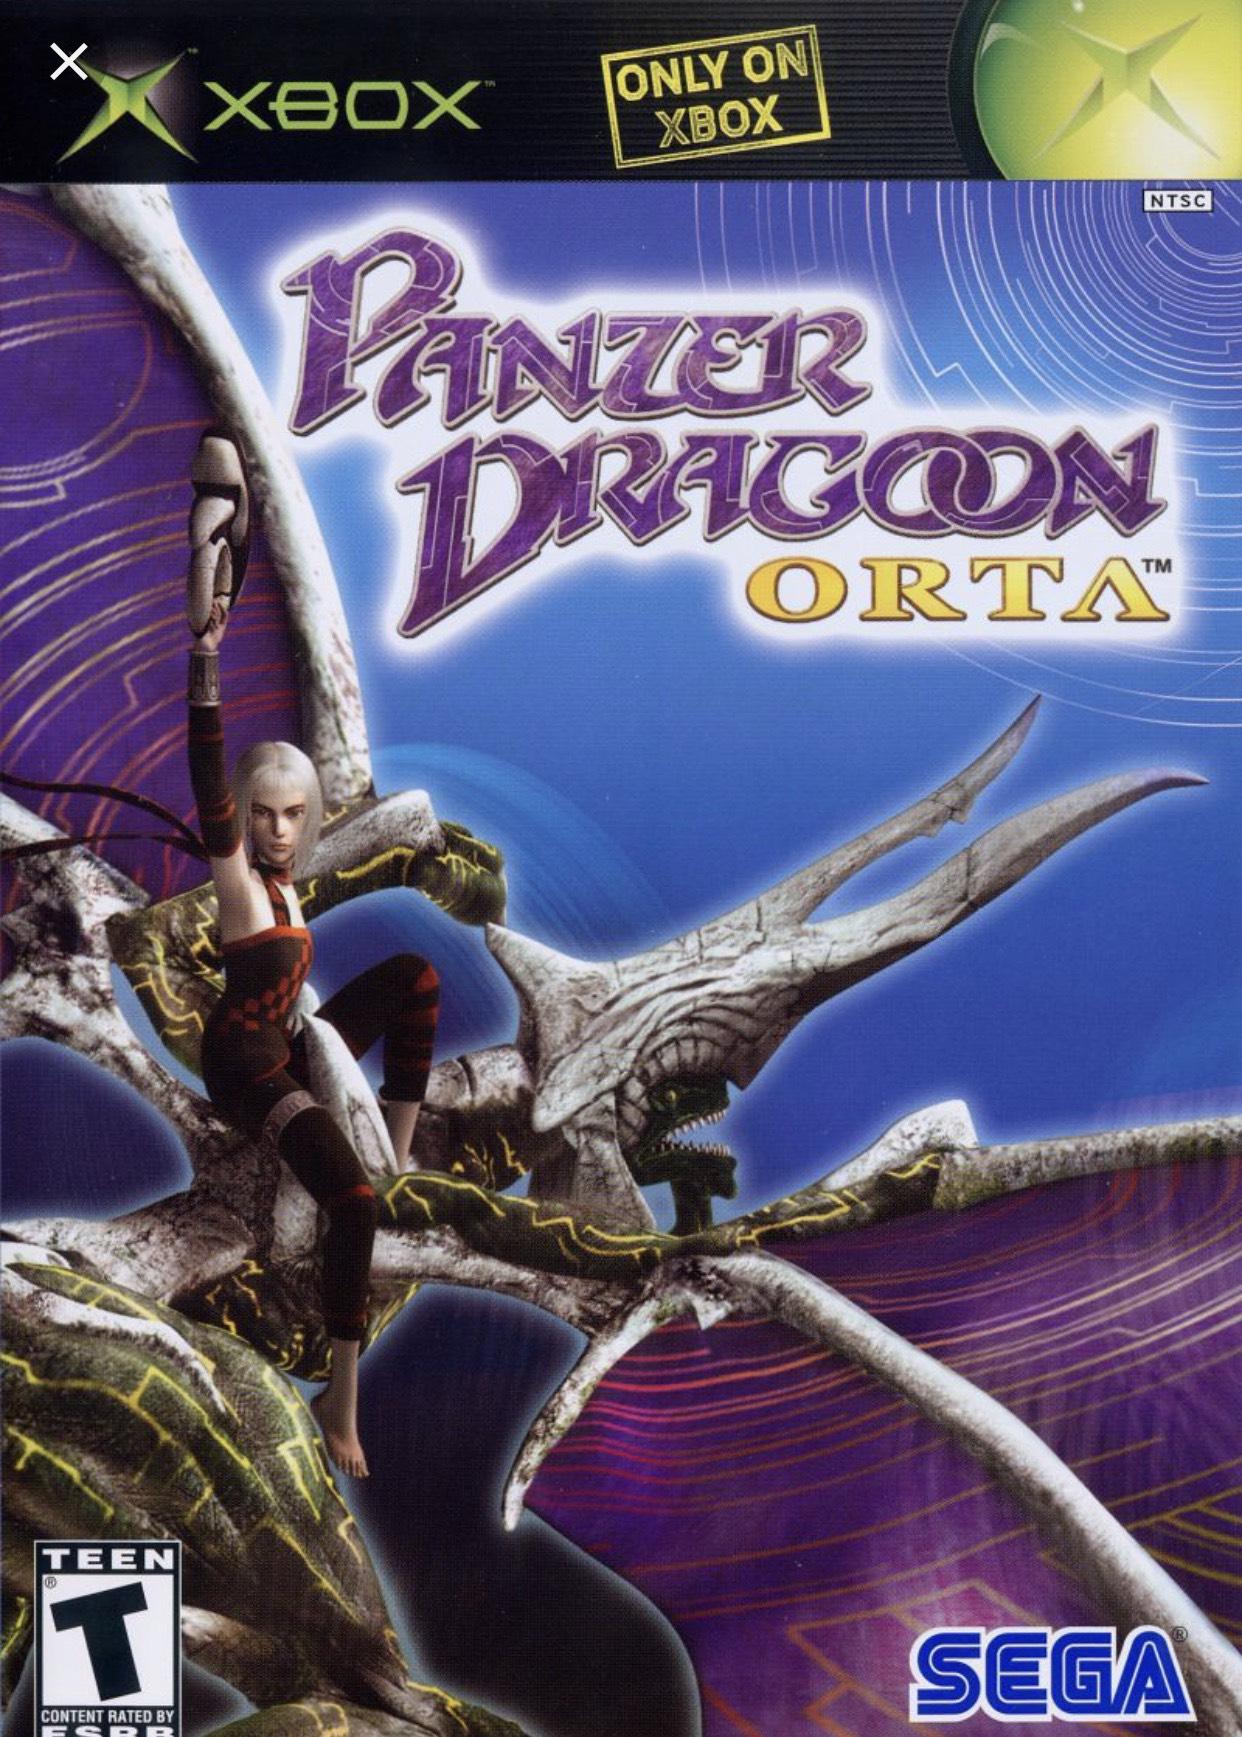 Panzer Dragoon Orta (Xbox/Xbox one) @ Microsoft store - £4.49